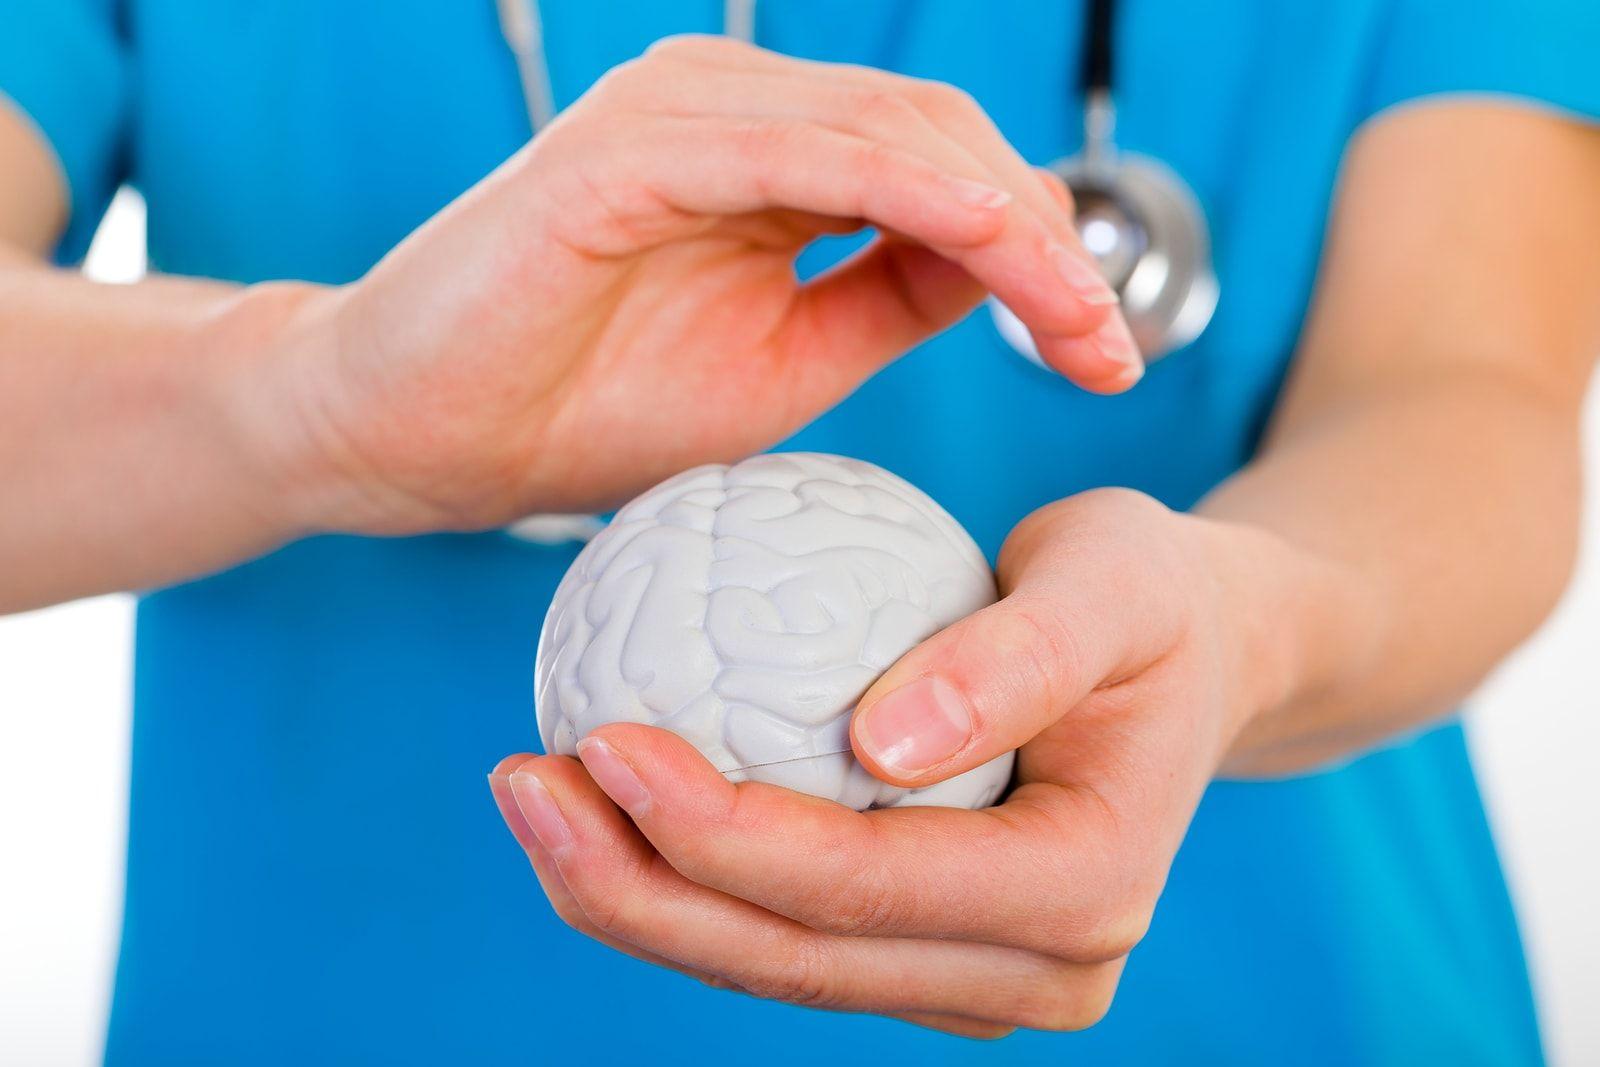 PsychiatricMental Health Nurse Job Description